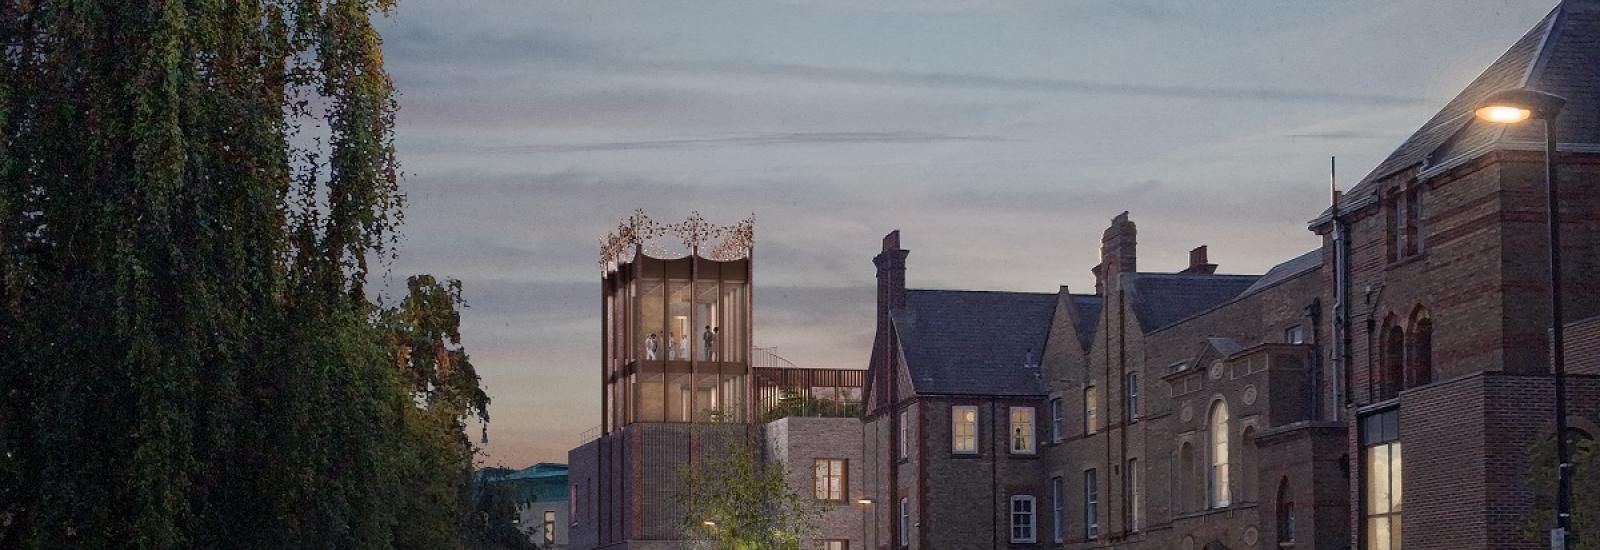 Transforming St Hilda's College Site